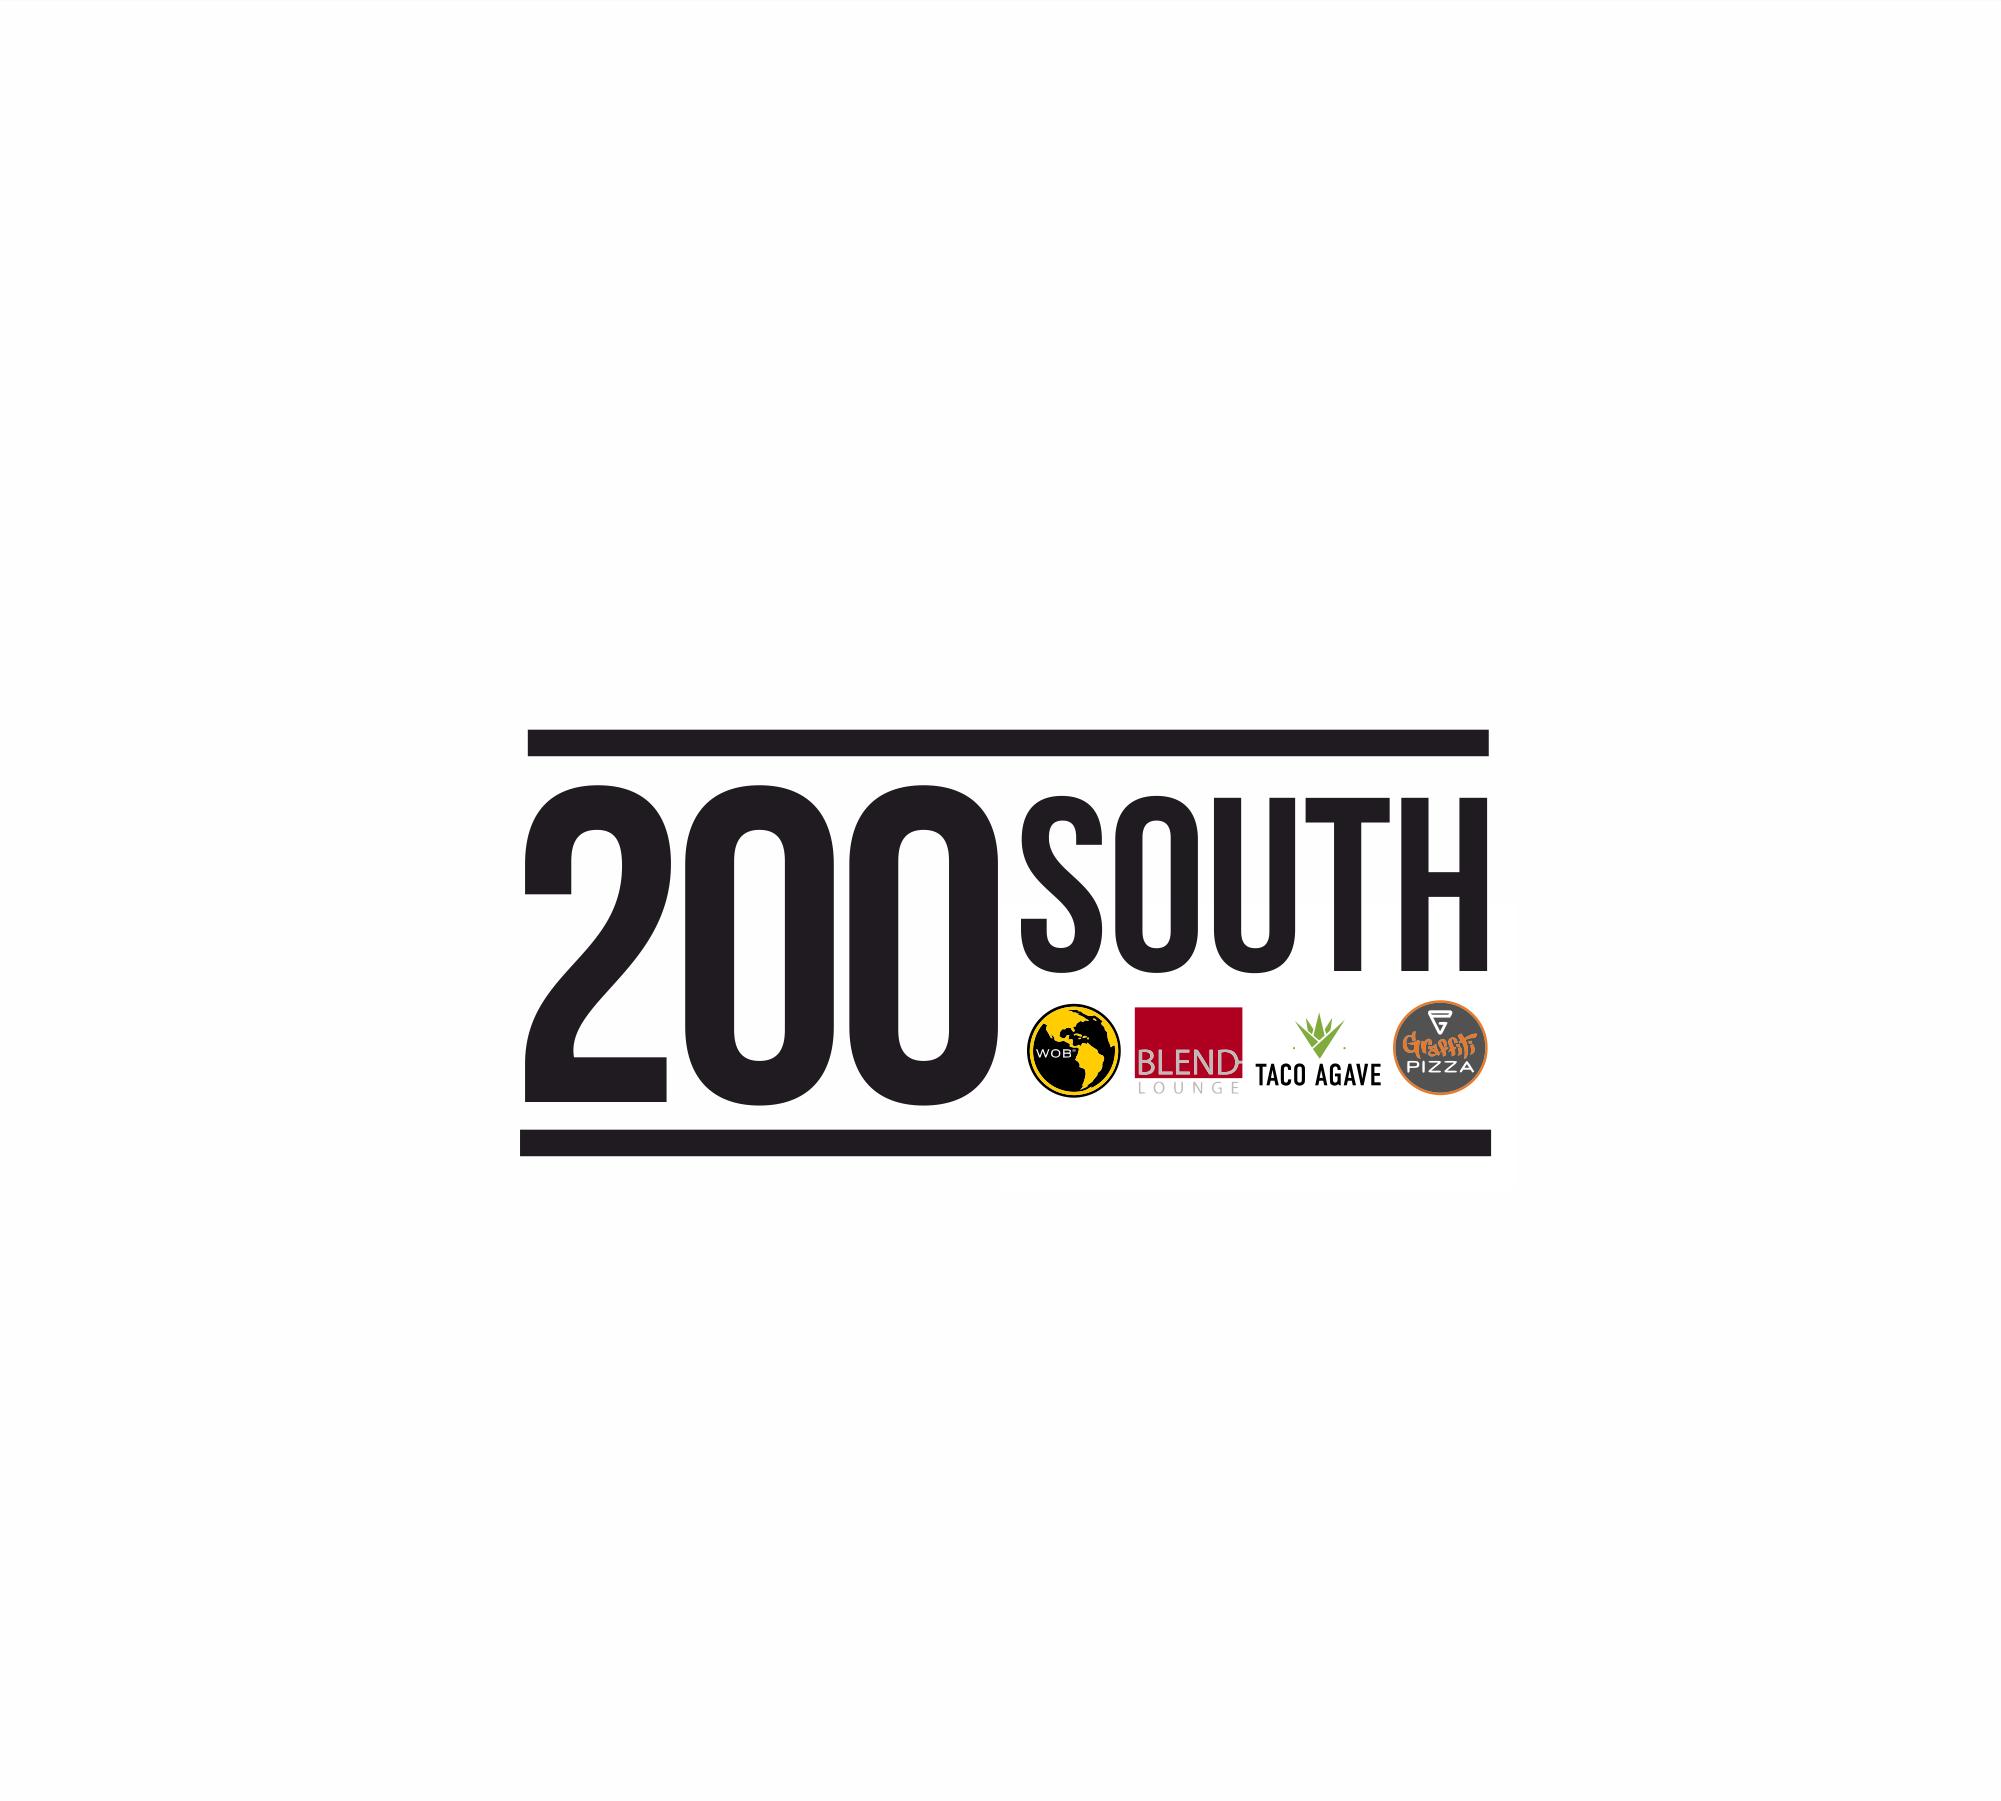 200 South